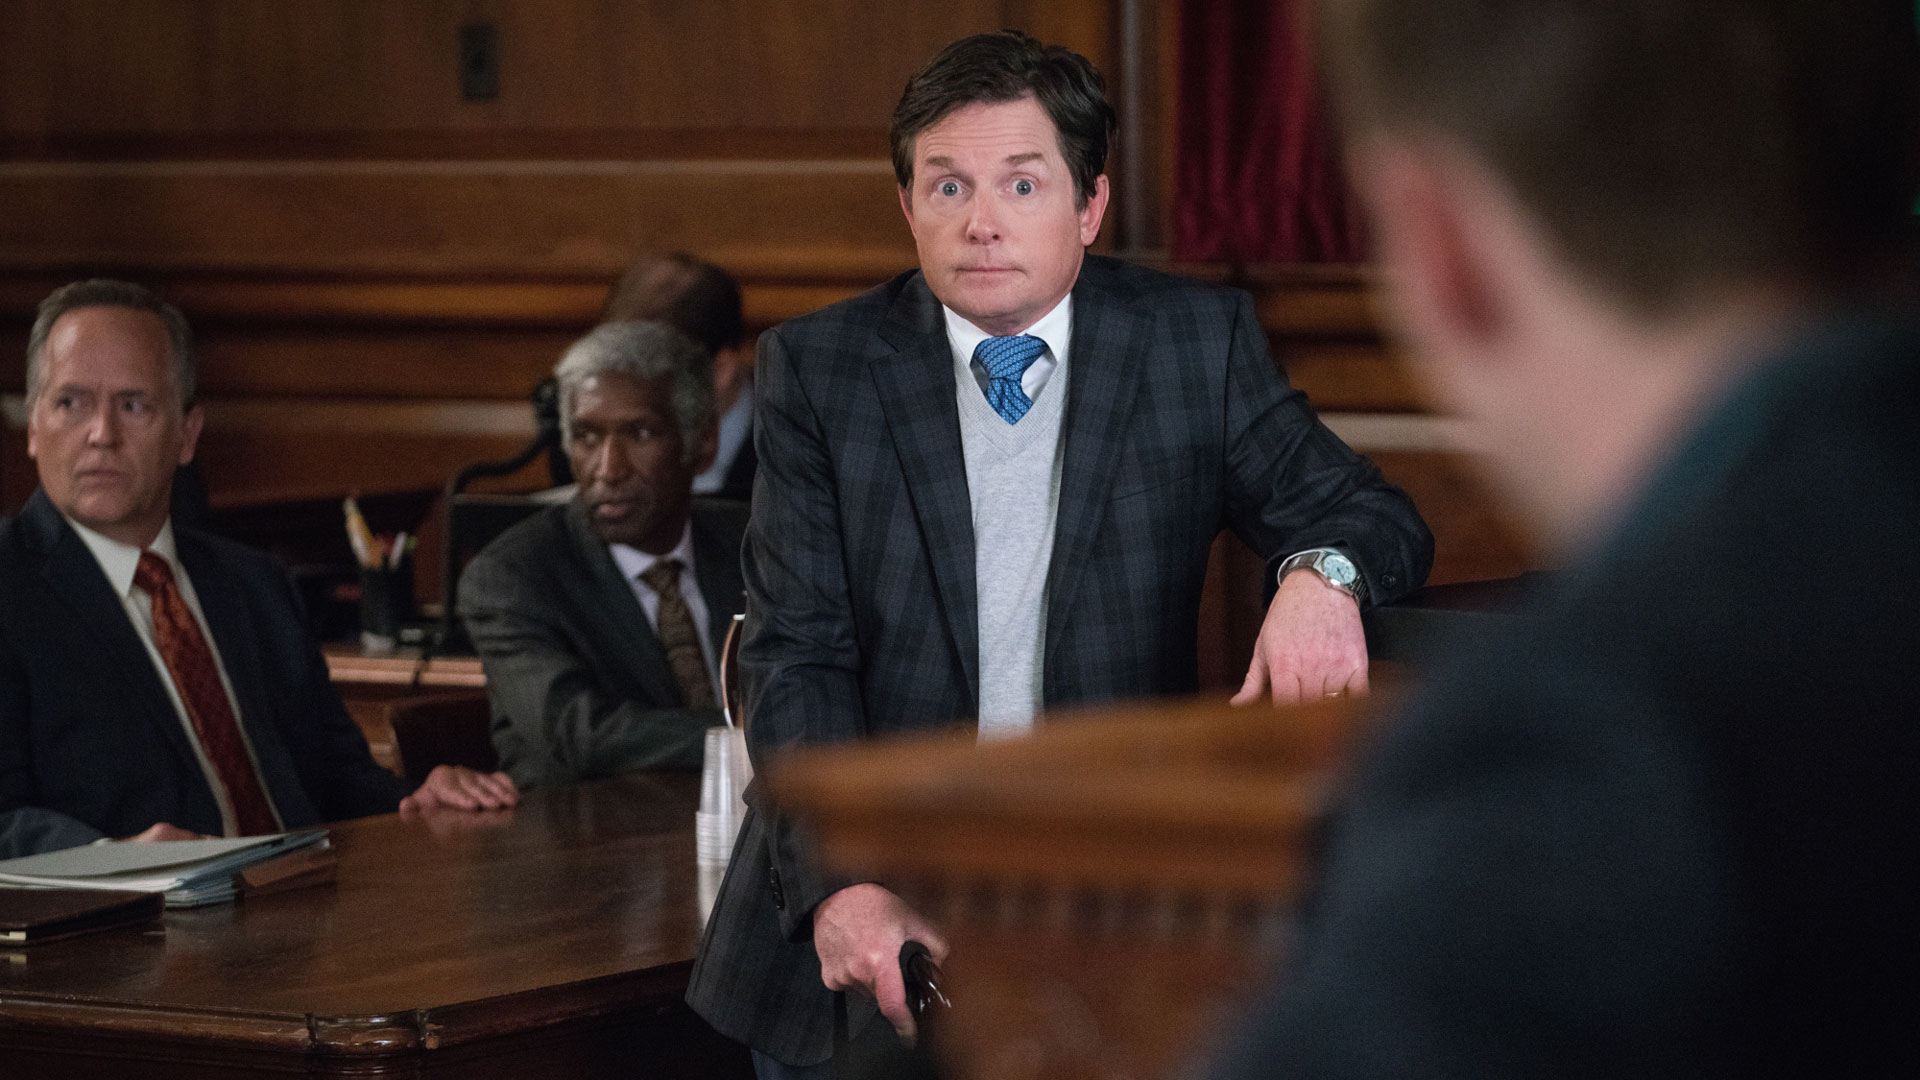 Michael J. Fox as Louis Canning